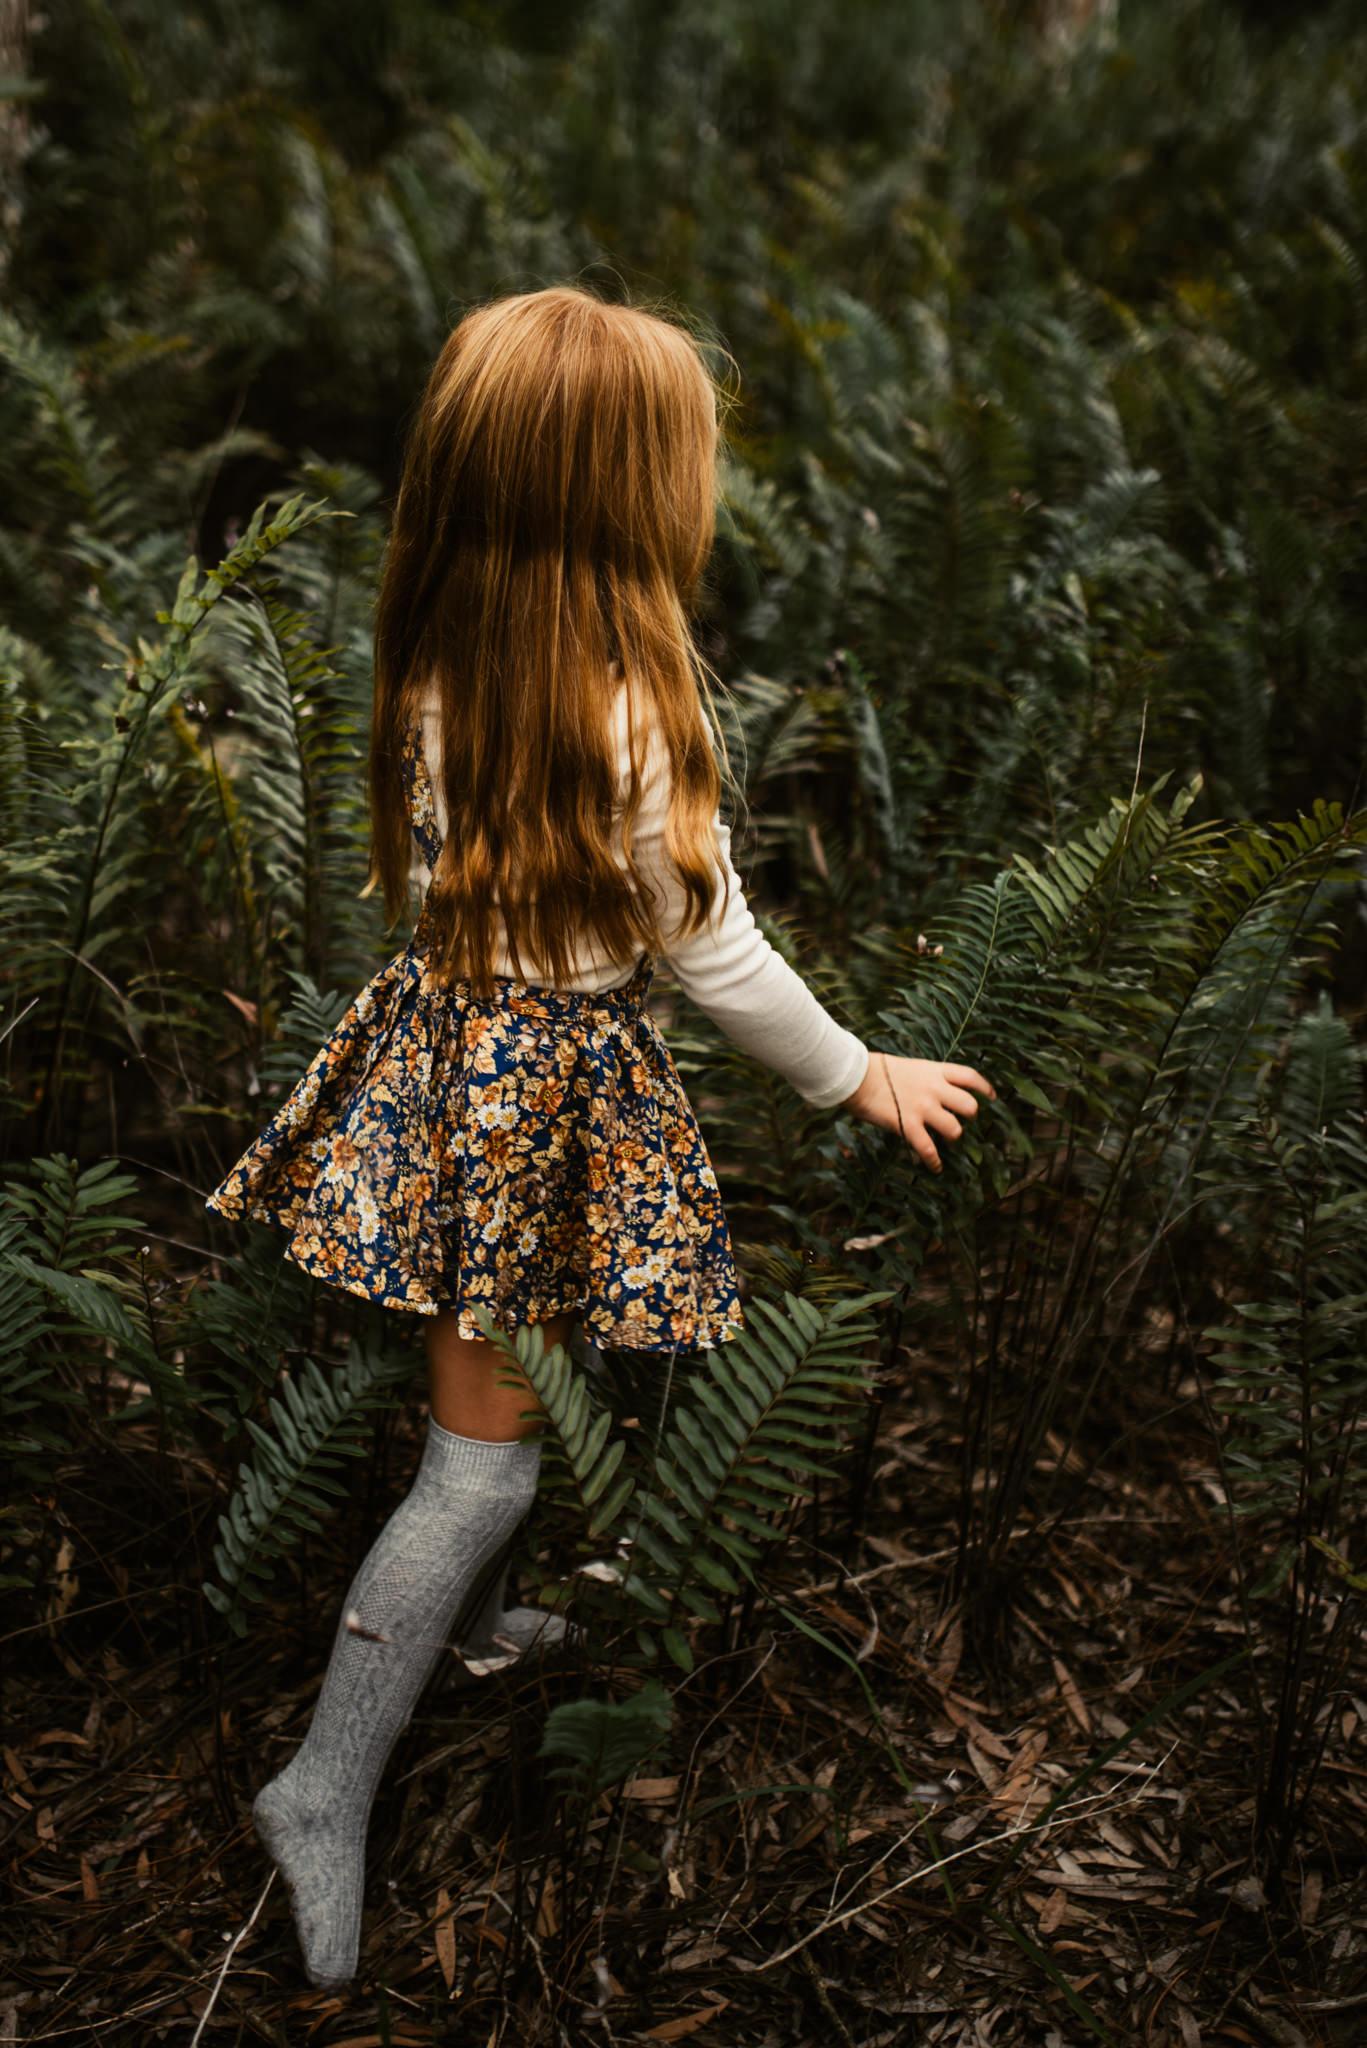 twyla jones photography - treasure coast florida - childrens adventure clothing commercial shoot--12.jpg